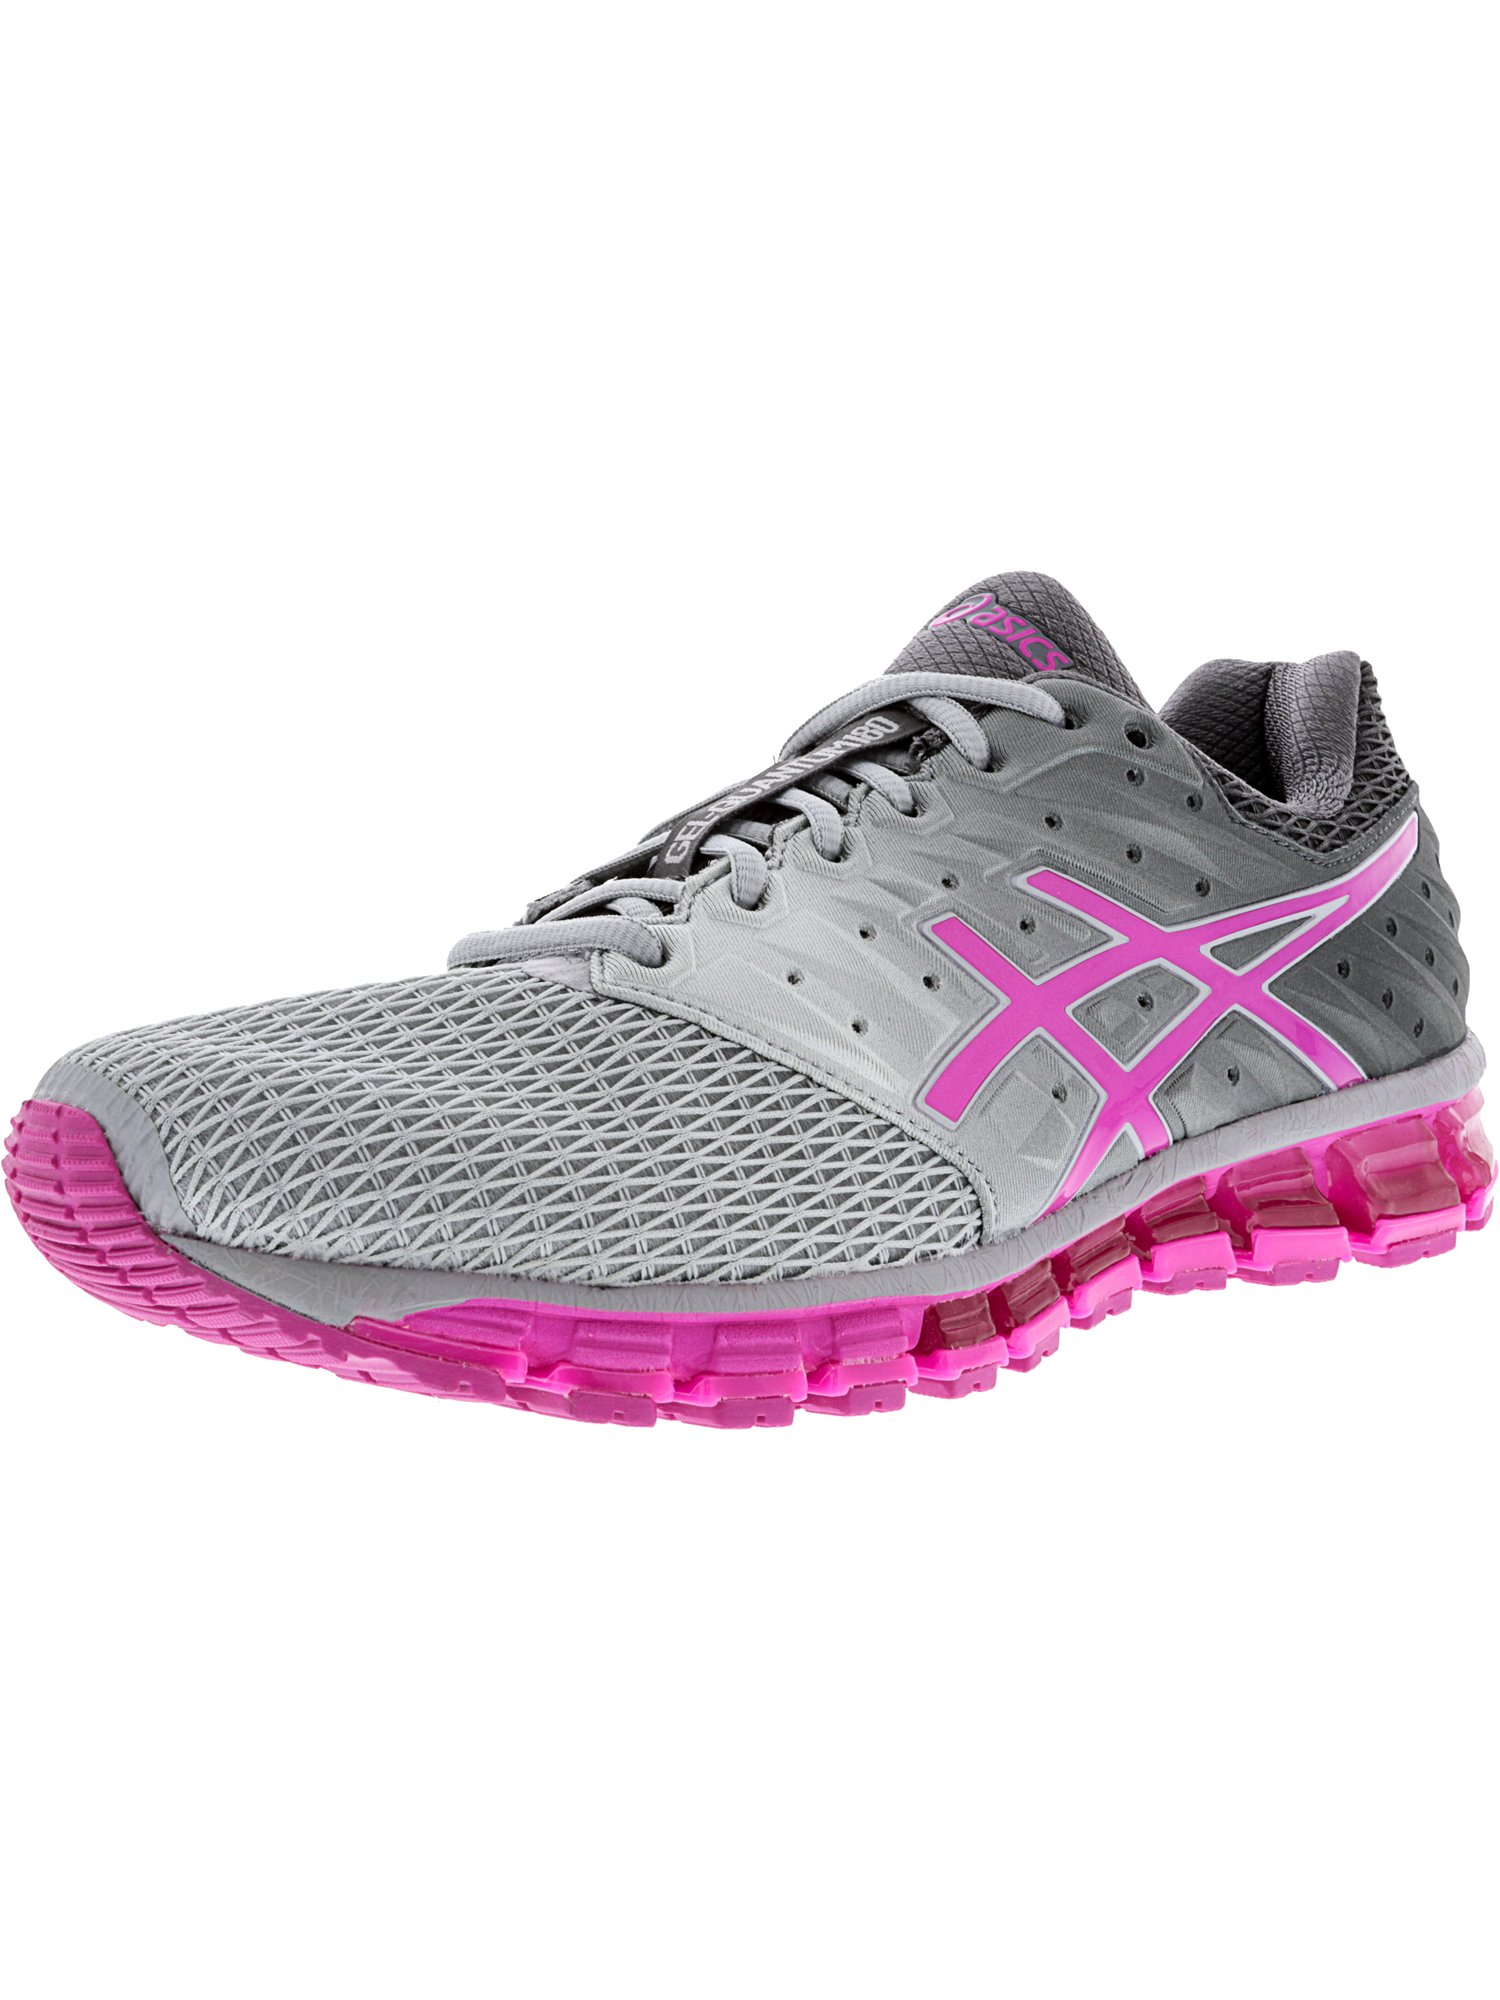 Asics Women's Gel-Quantum 180 2 Midgrey / Pink Glow Carbon Ankle-High Running Shoe - 5M